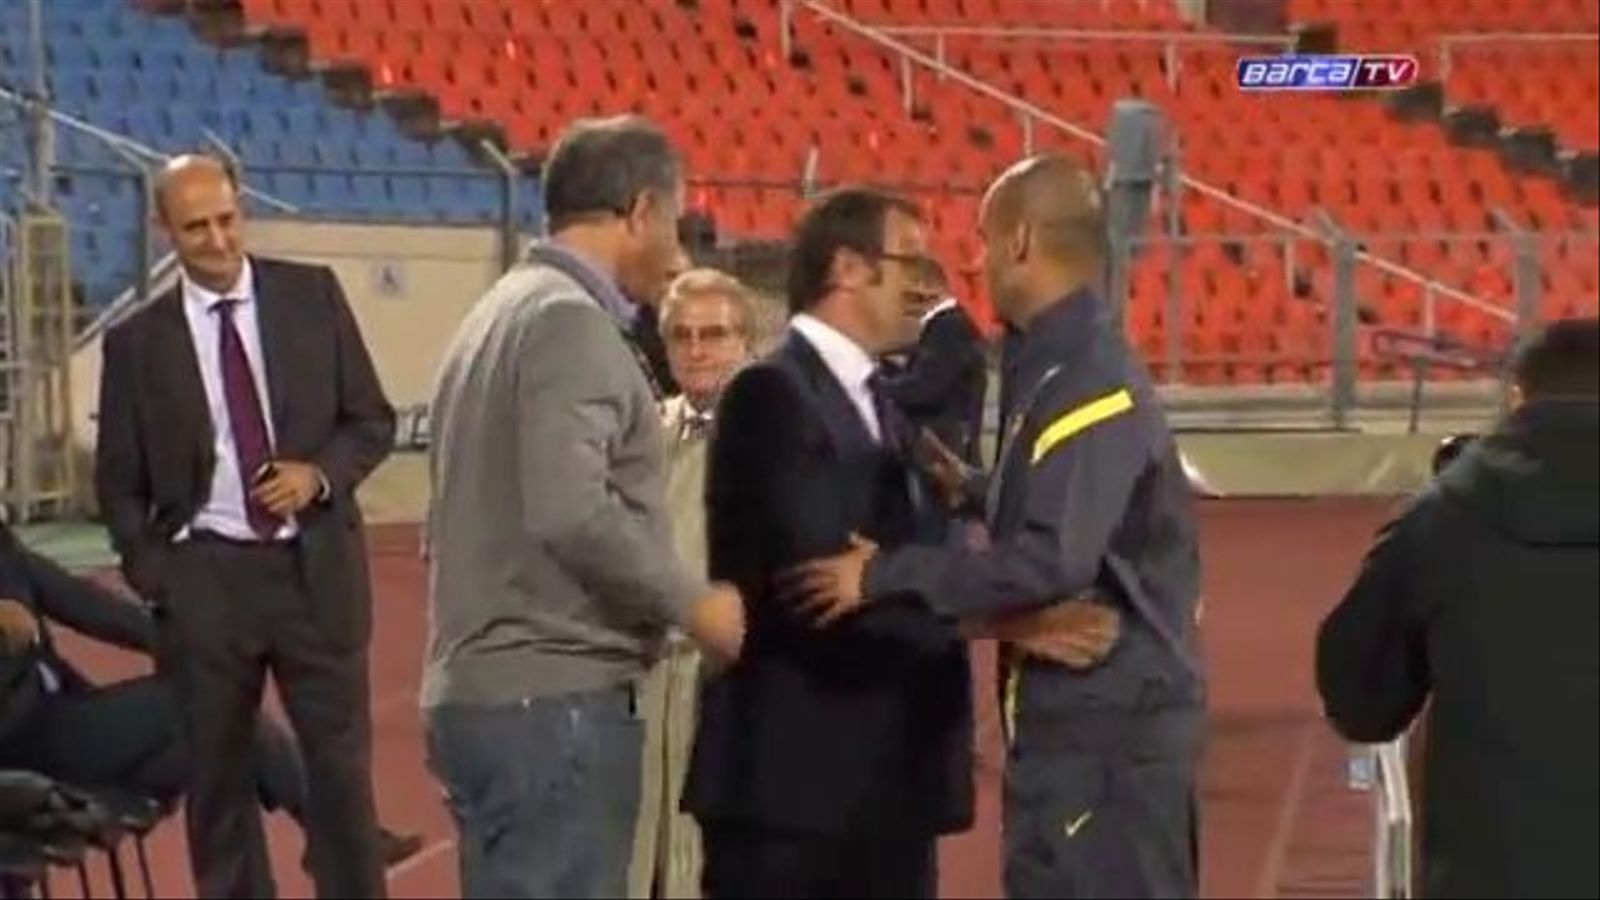 Pep Guardiola i Sandro Rosell s'abracen abans de l'entrenament